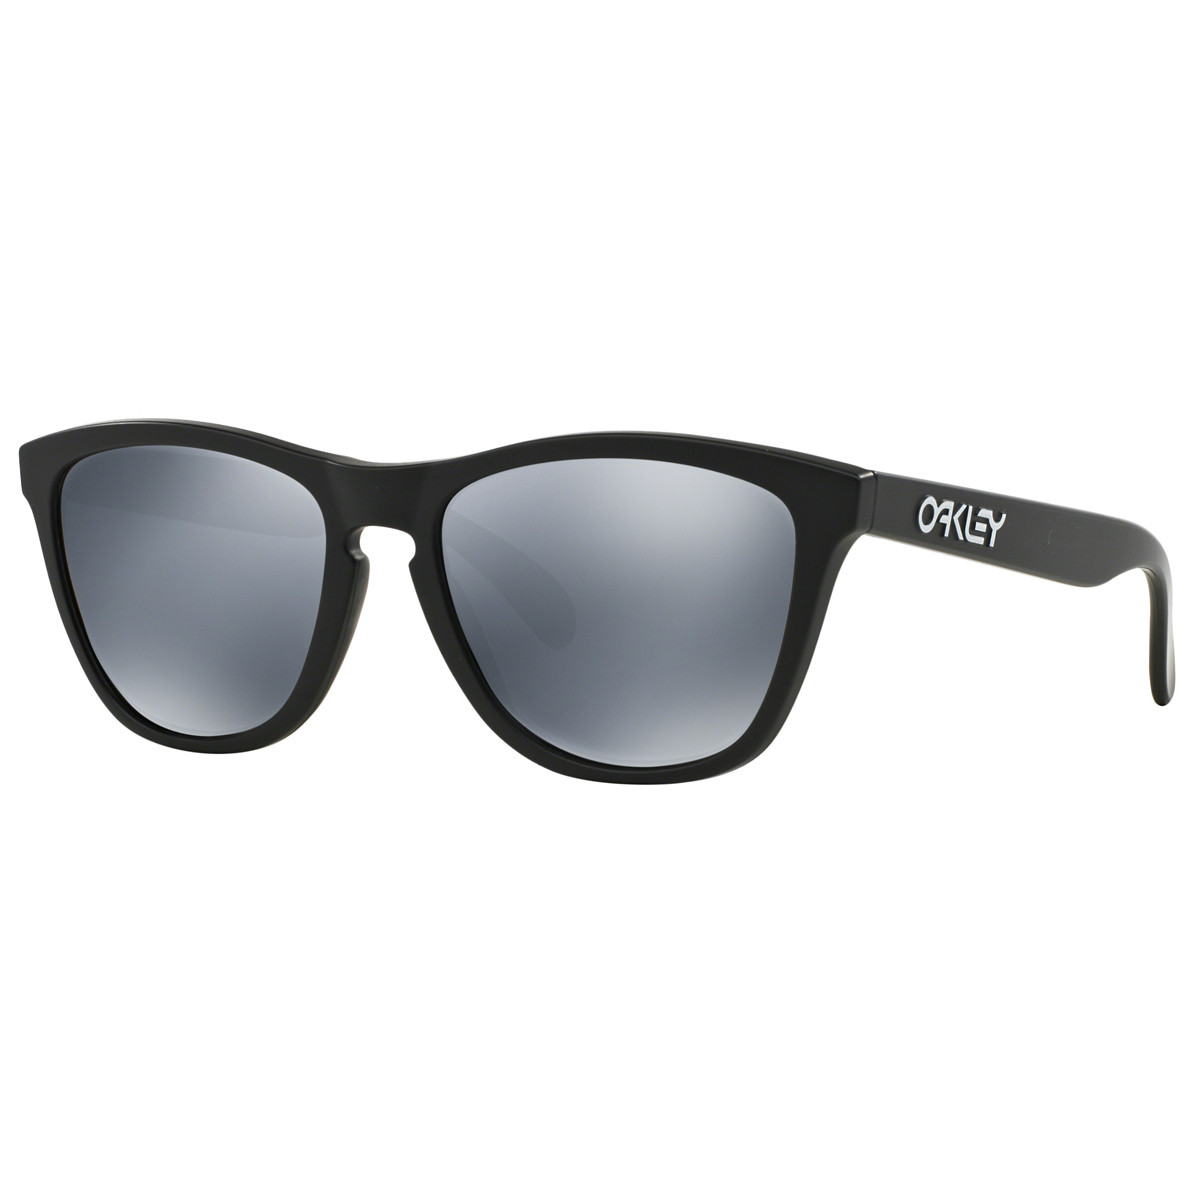 Óculos Oakley Frogskins Matte Black  Lente Black Iridium Polarizado ... c8088213d6